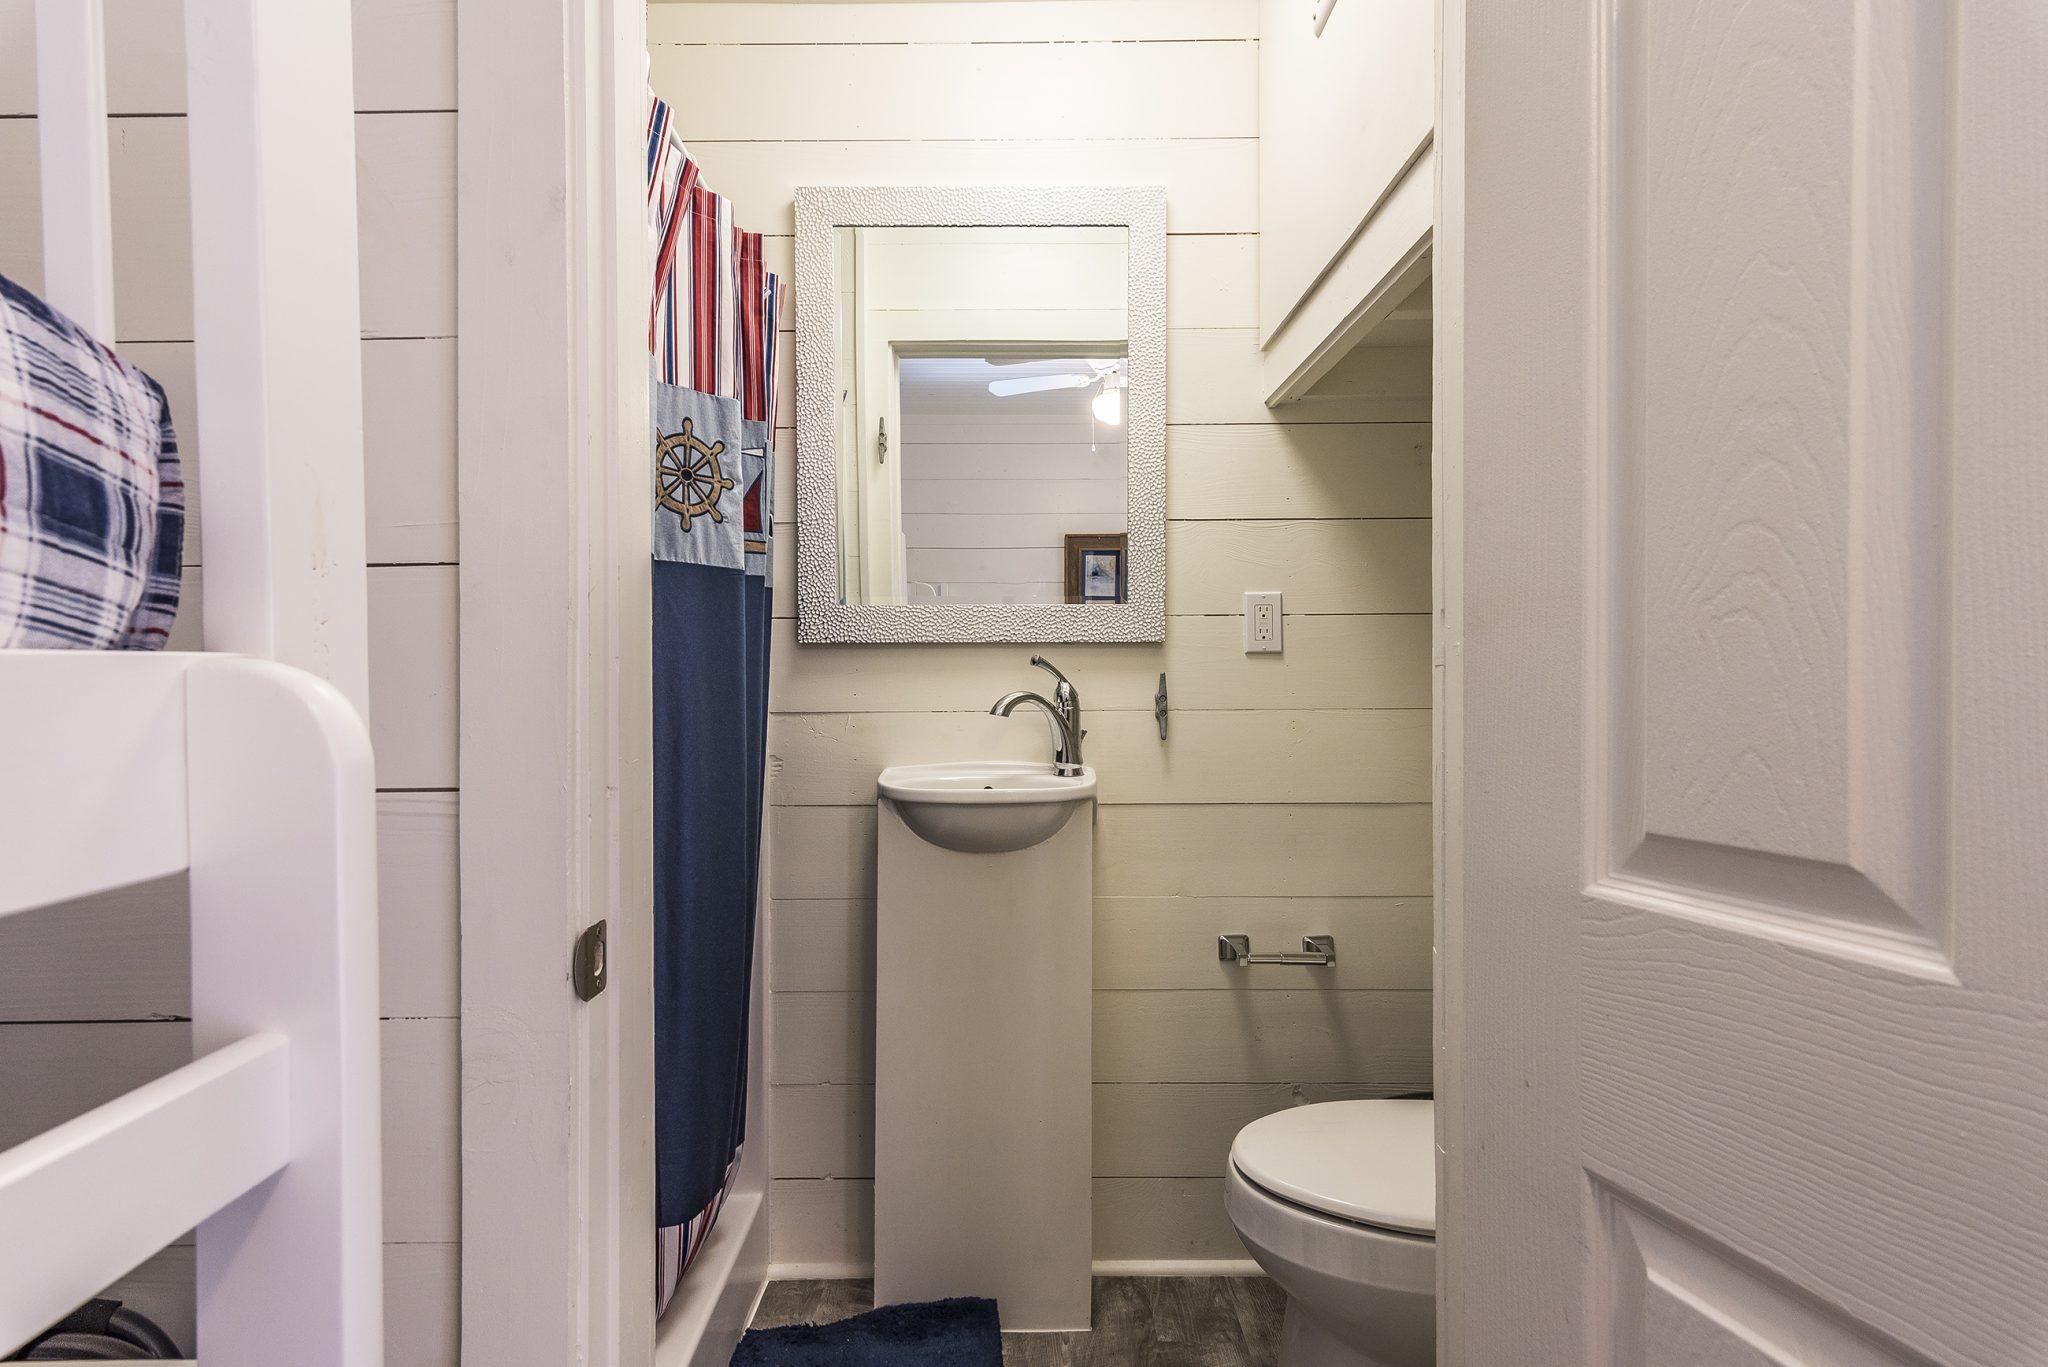 BW Spoonbill Cottage Bath